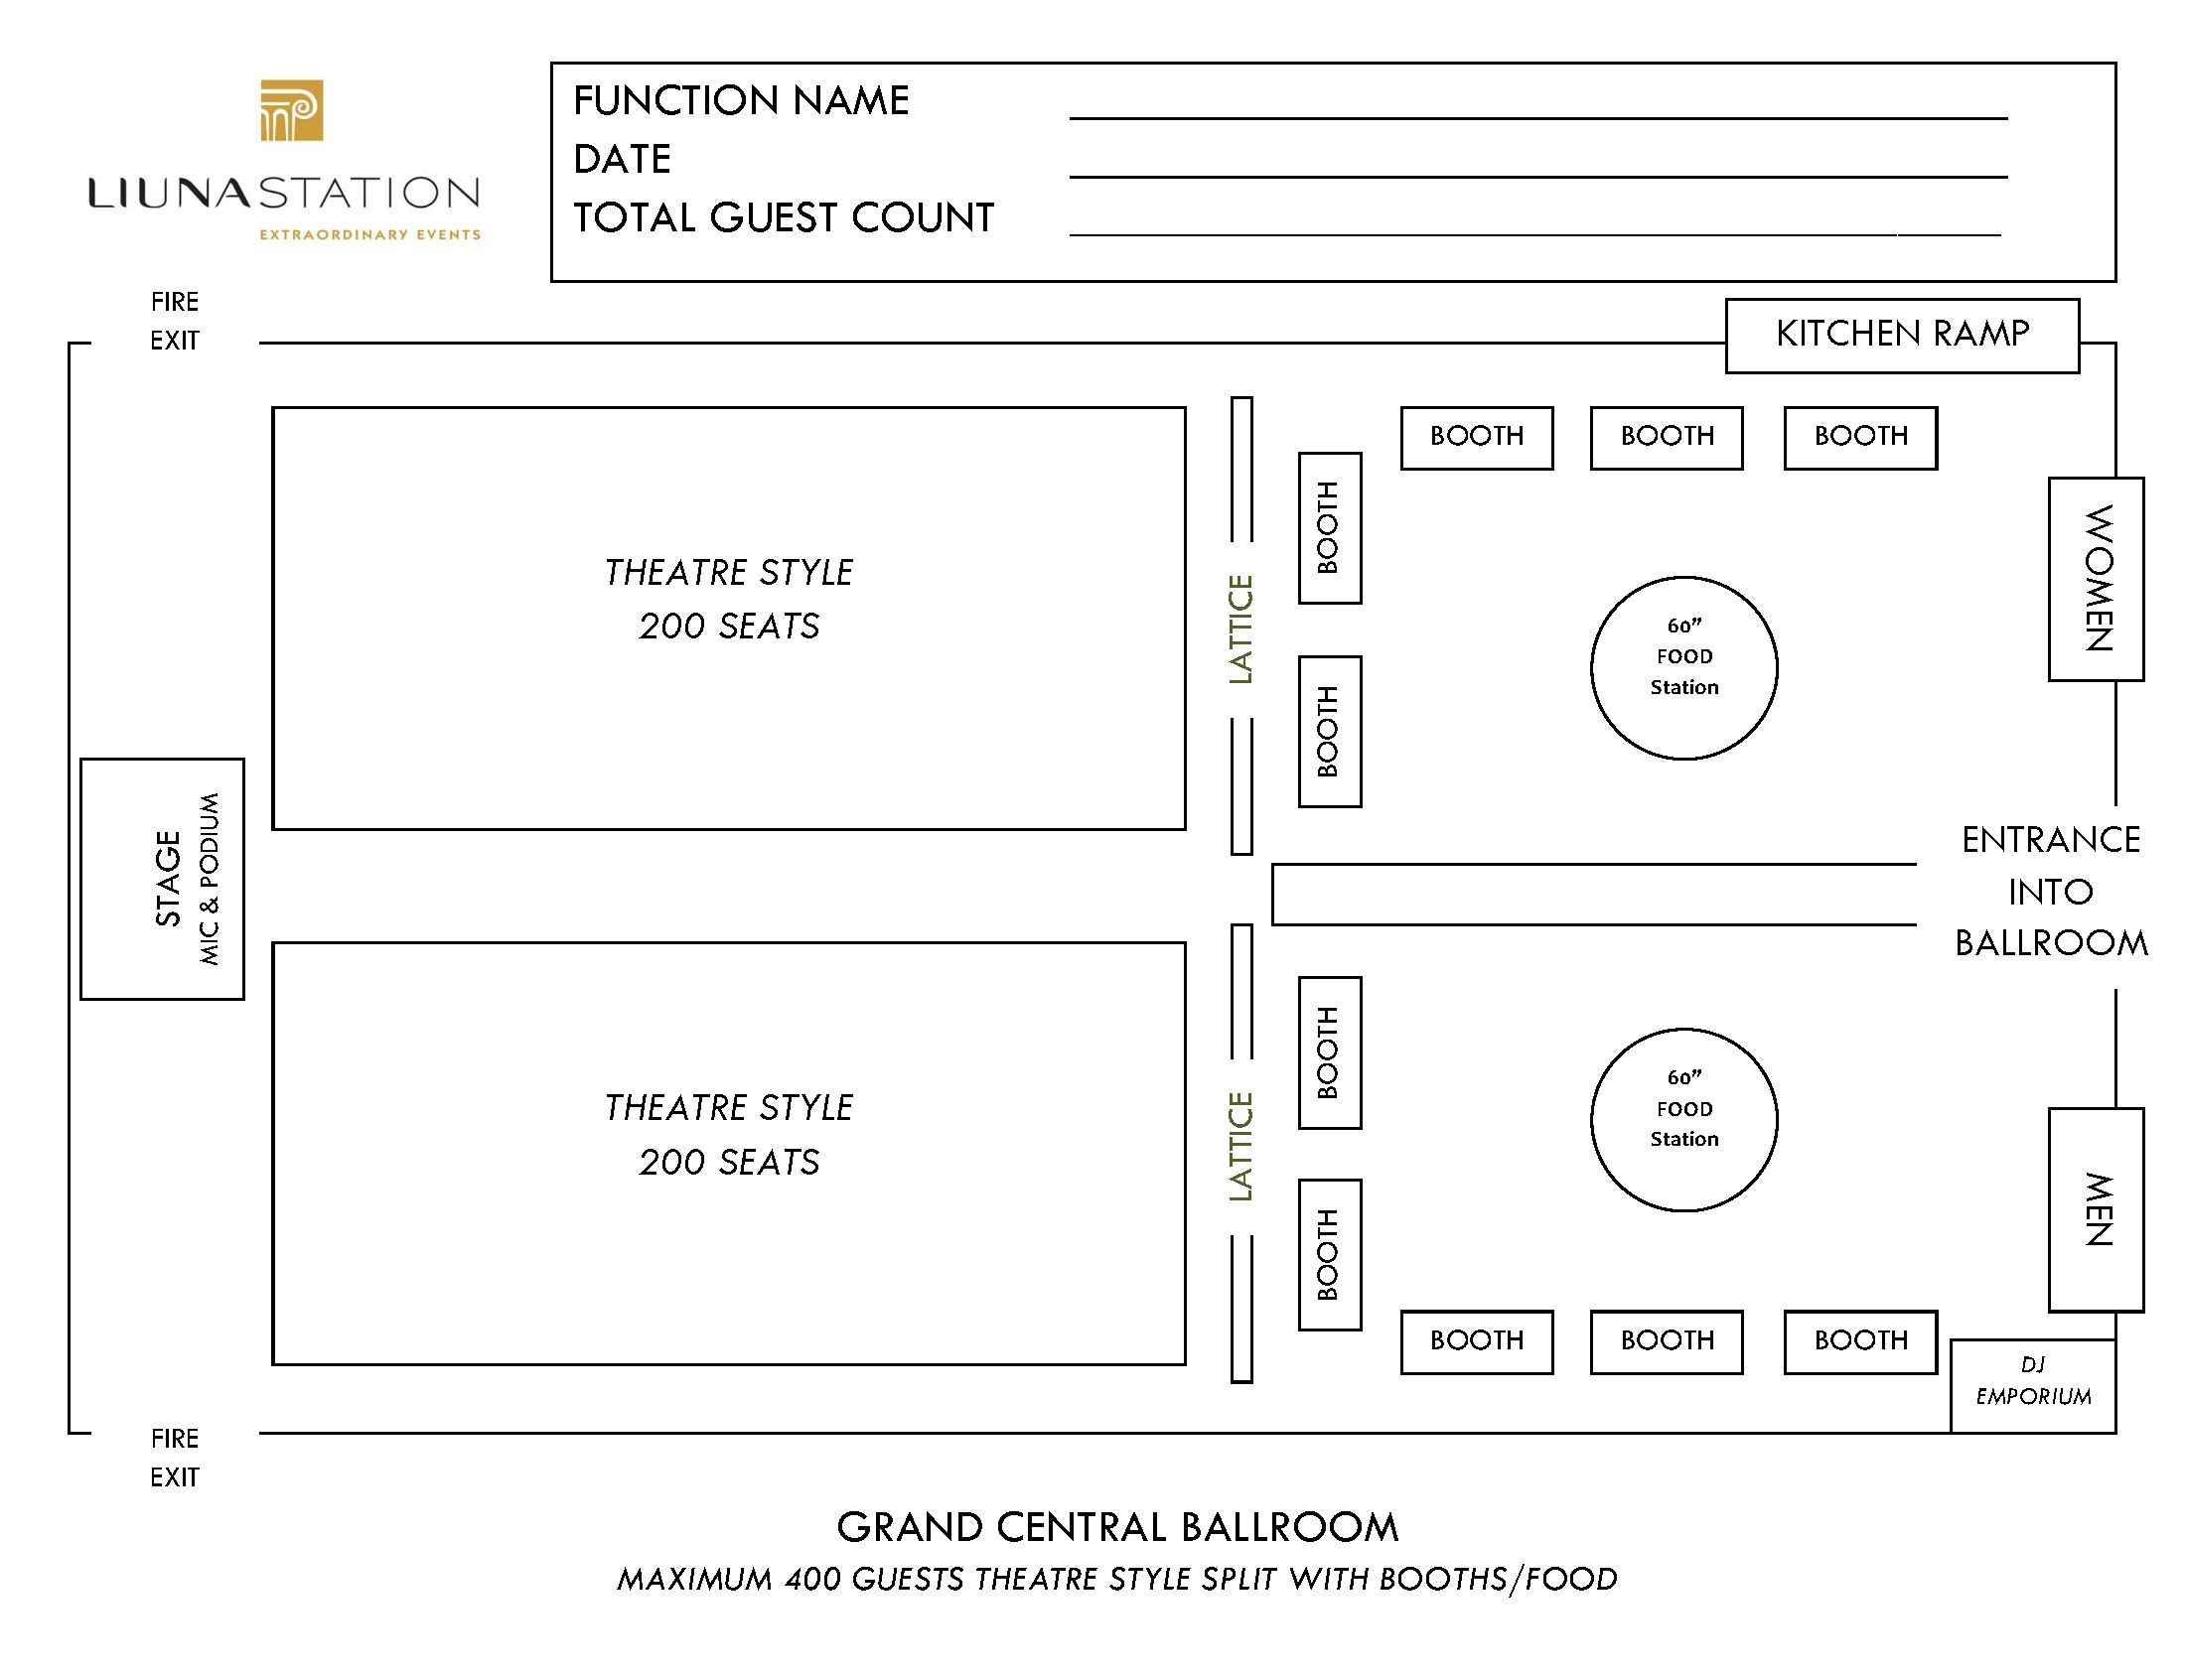 Station Floorplans - Grand Central Ballroom